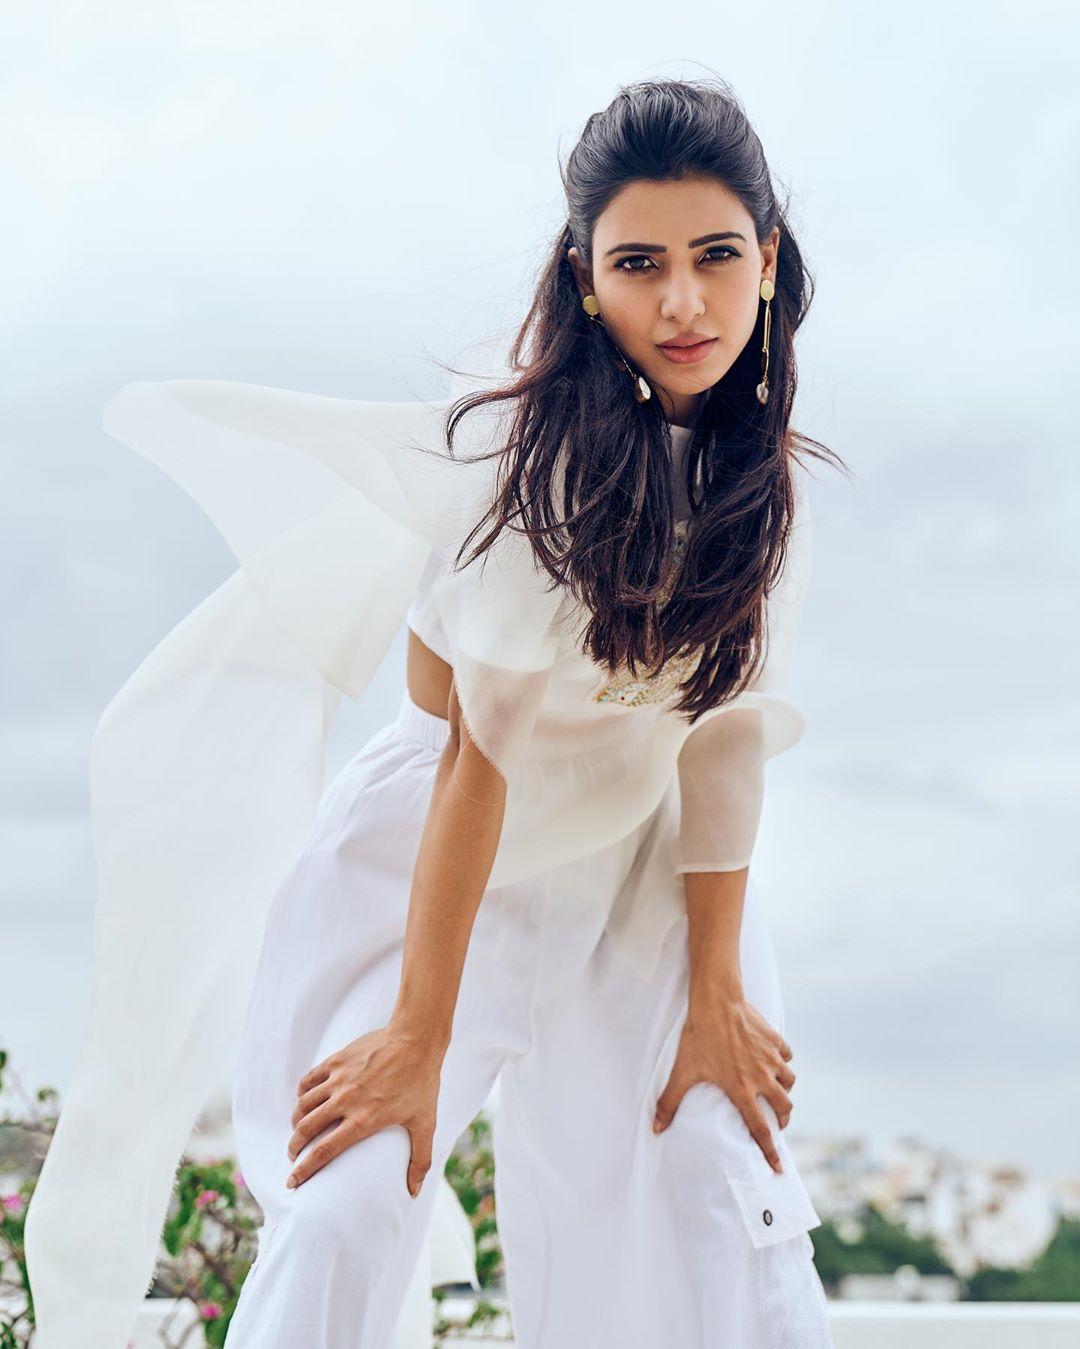 Samantha-Akkineni-Wallpapers-Insta-Fit-Bio-6